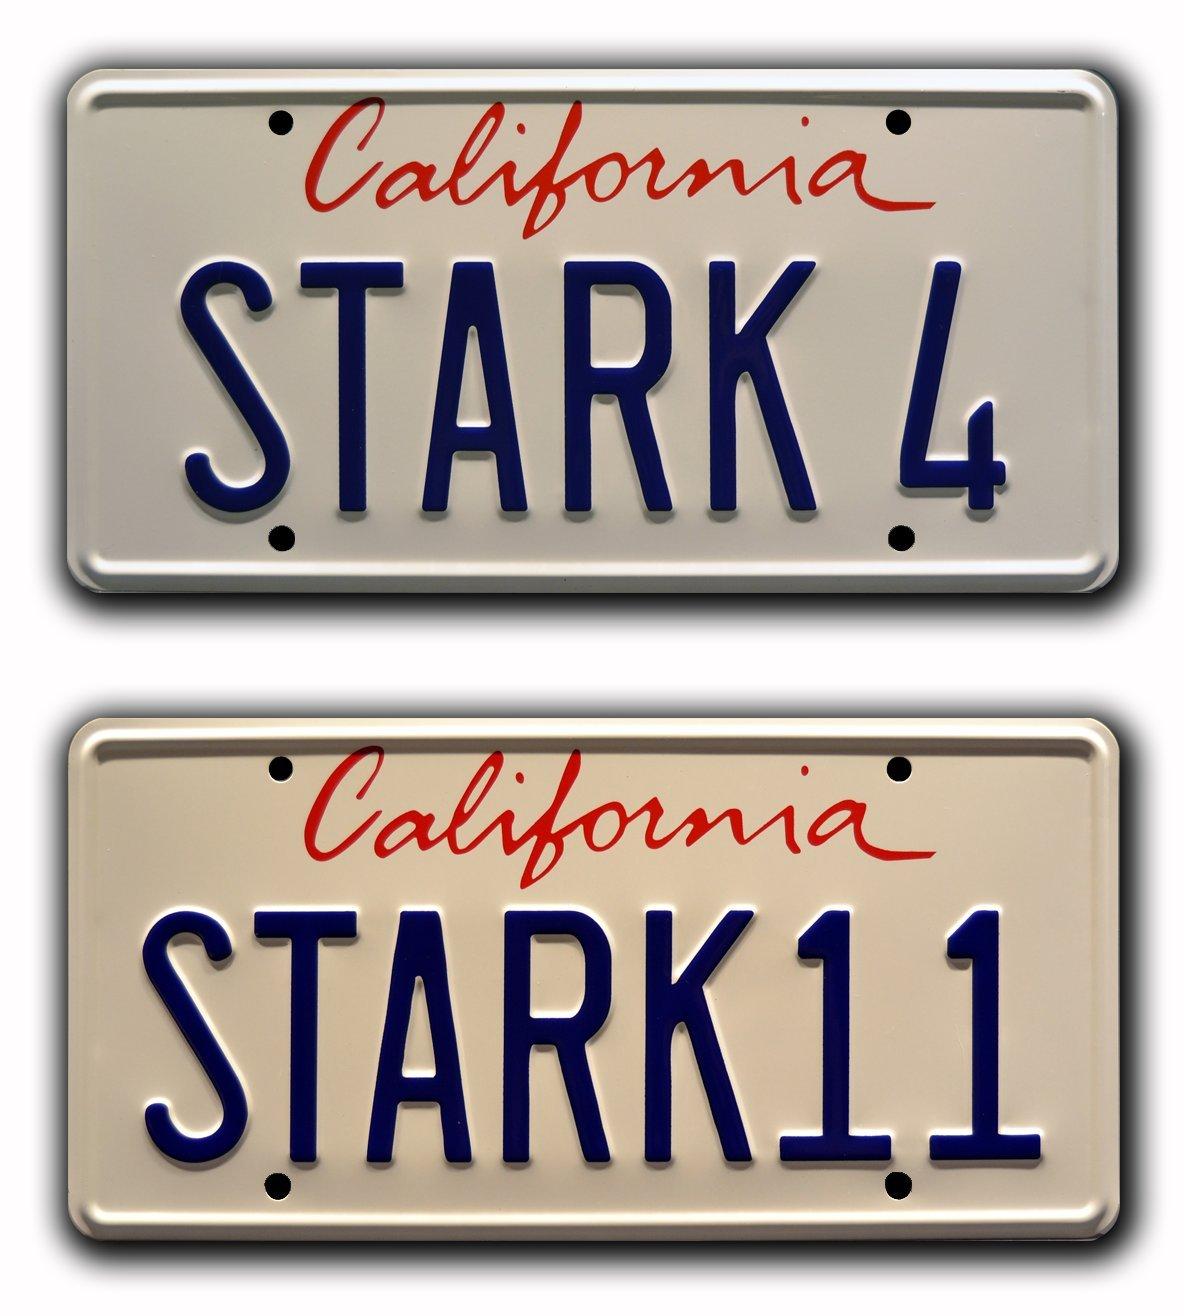 Metal Stamped Vanity Prop Targa 2007 Celebrity Machines Iron Man Tony Stark Audi R8/ Stark 4/